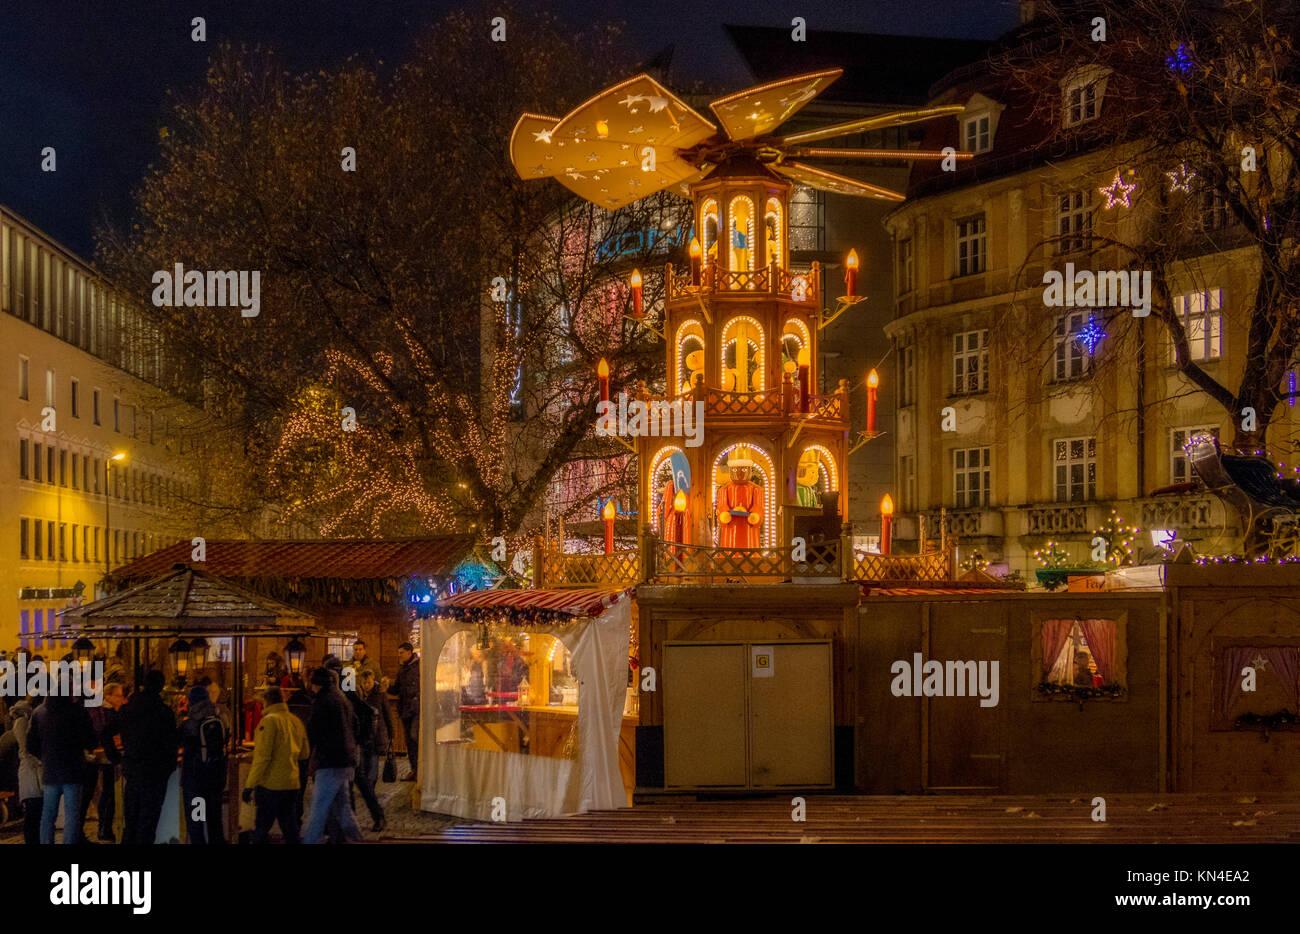 Christmas In Munich Germany.Christmas Market At Rindermarkt In Munich Bavaria Germany